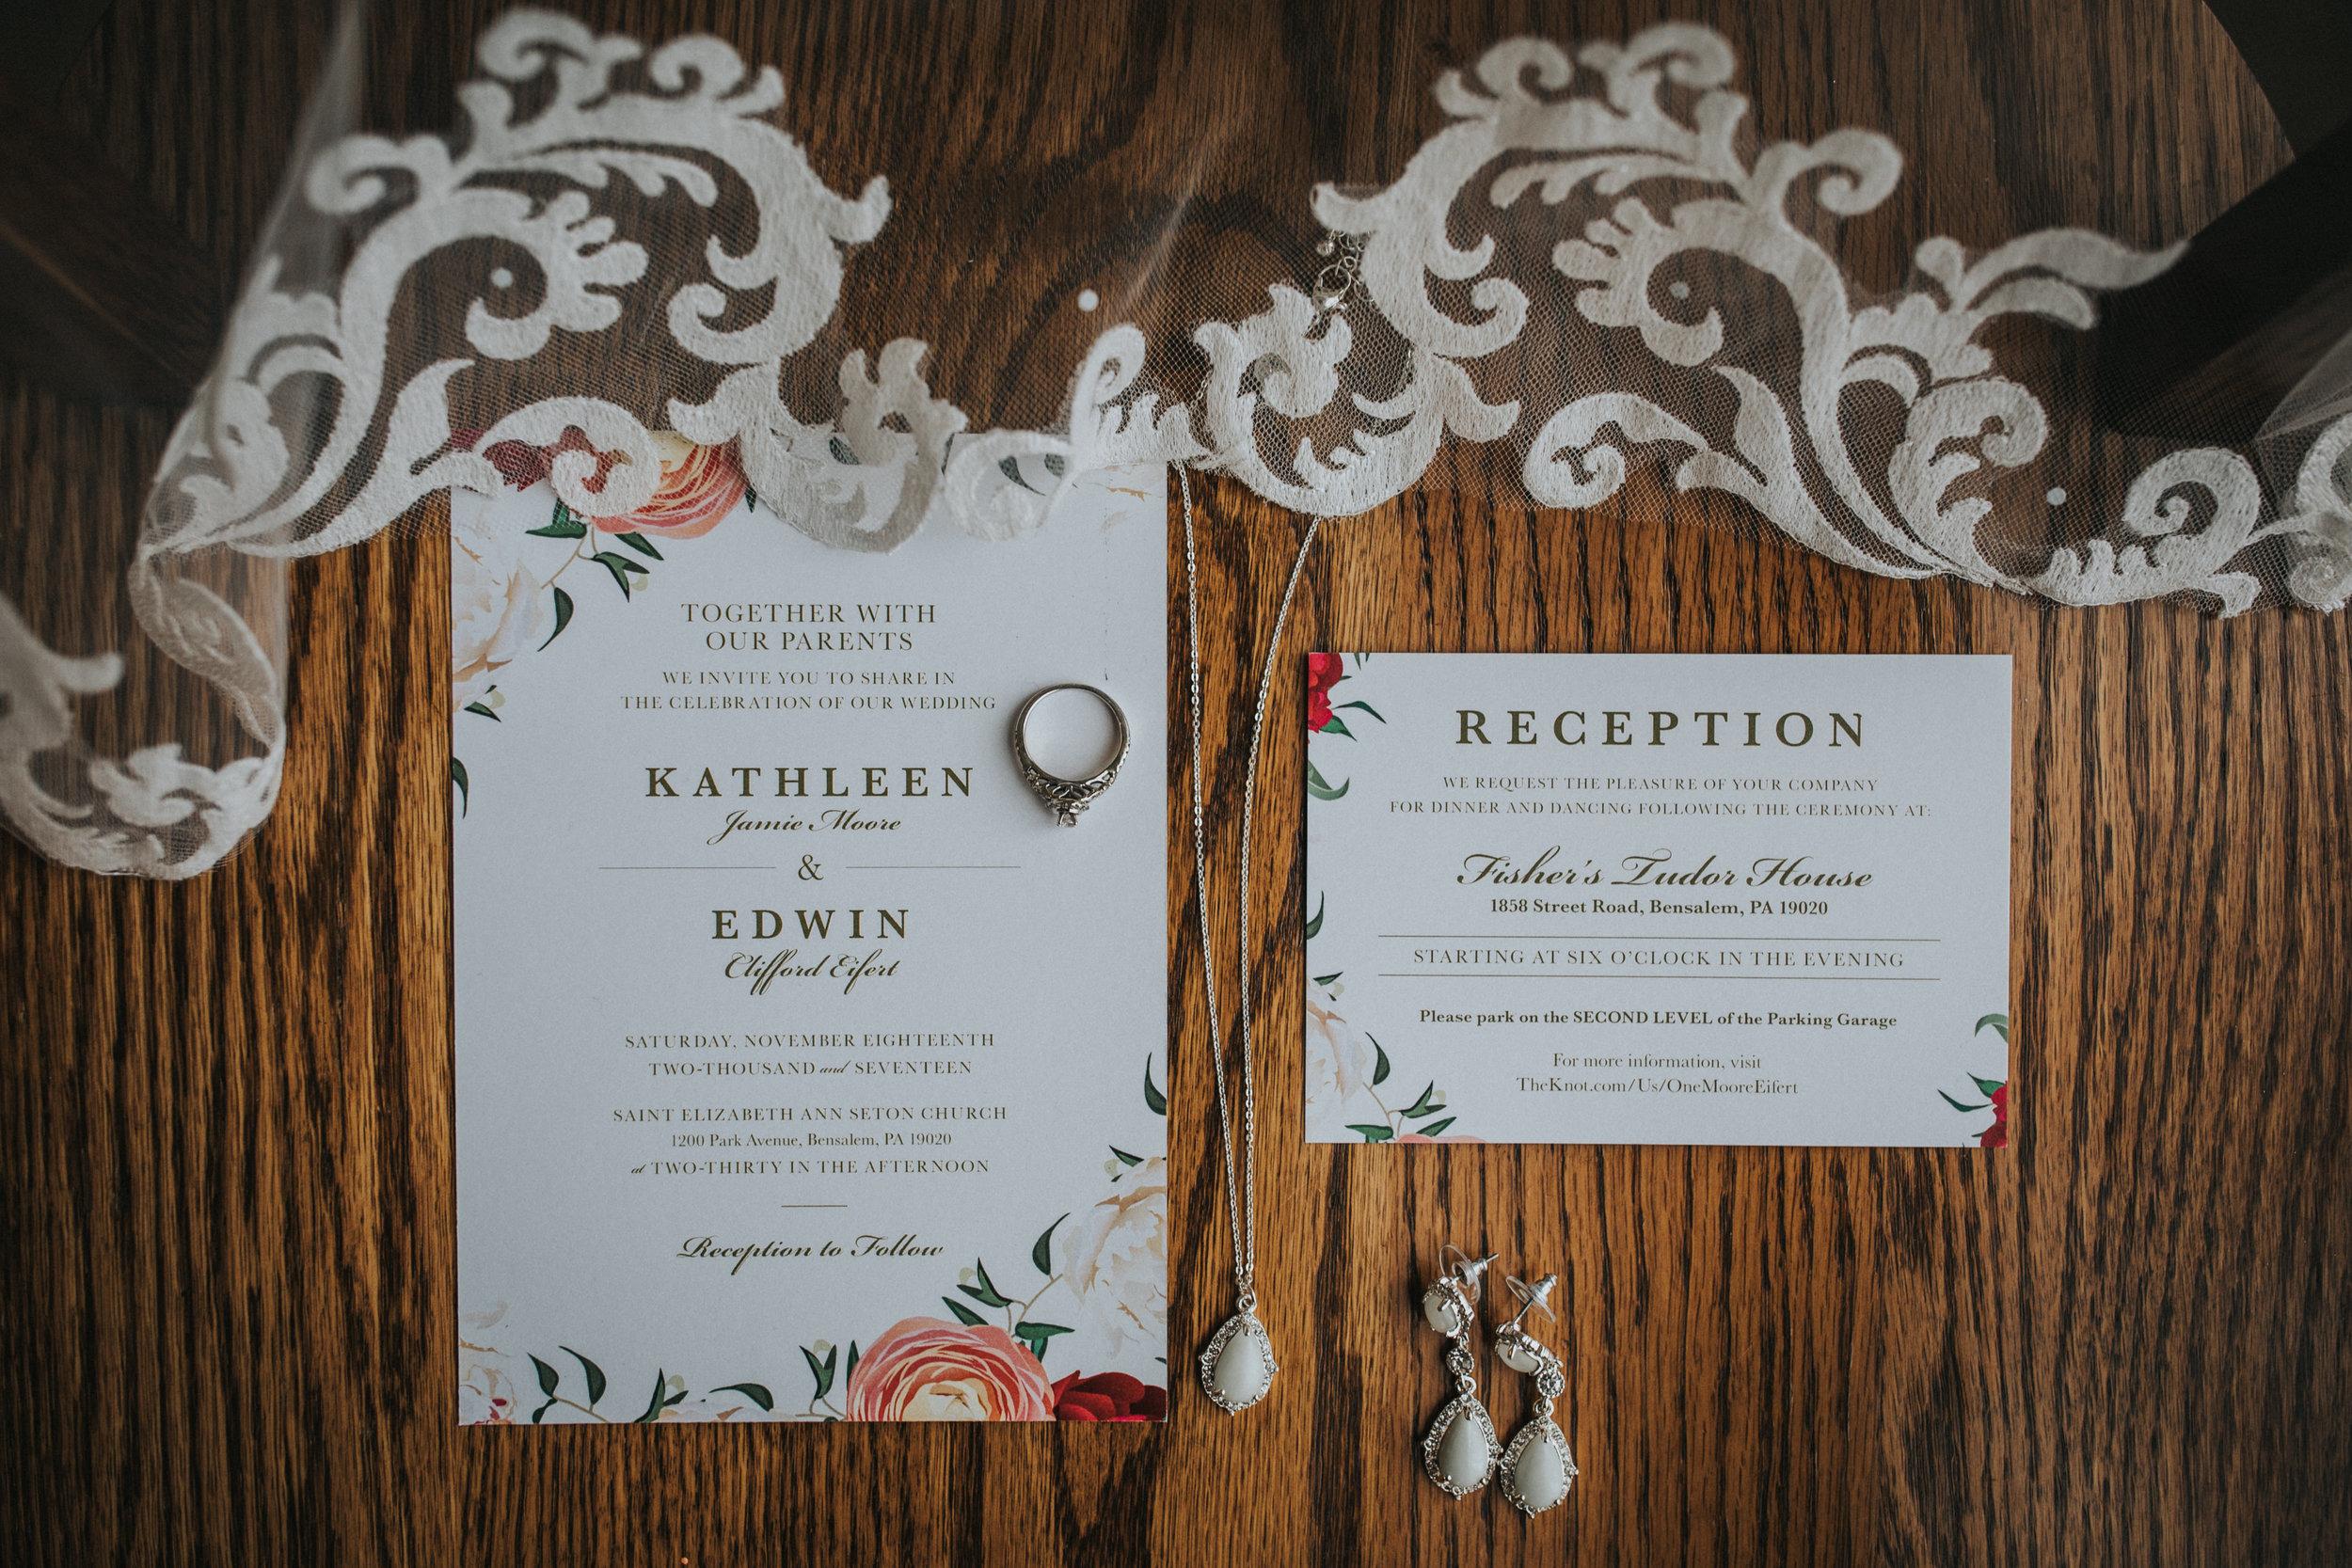 New-Jersey-Wedding-Photography-Fishers-Tudor-House-JennaLynnPhotography-Details-Kathleen&Eddie-2.jpg